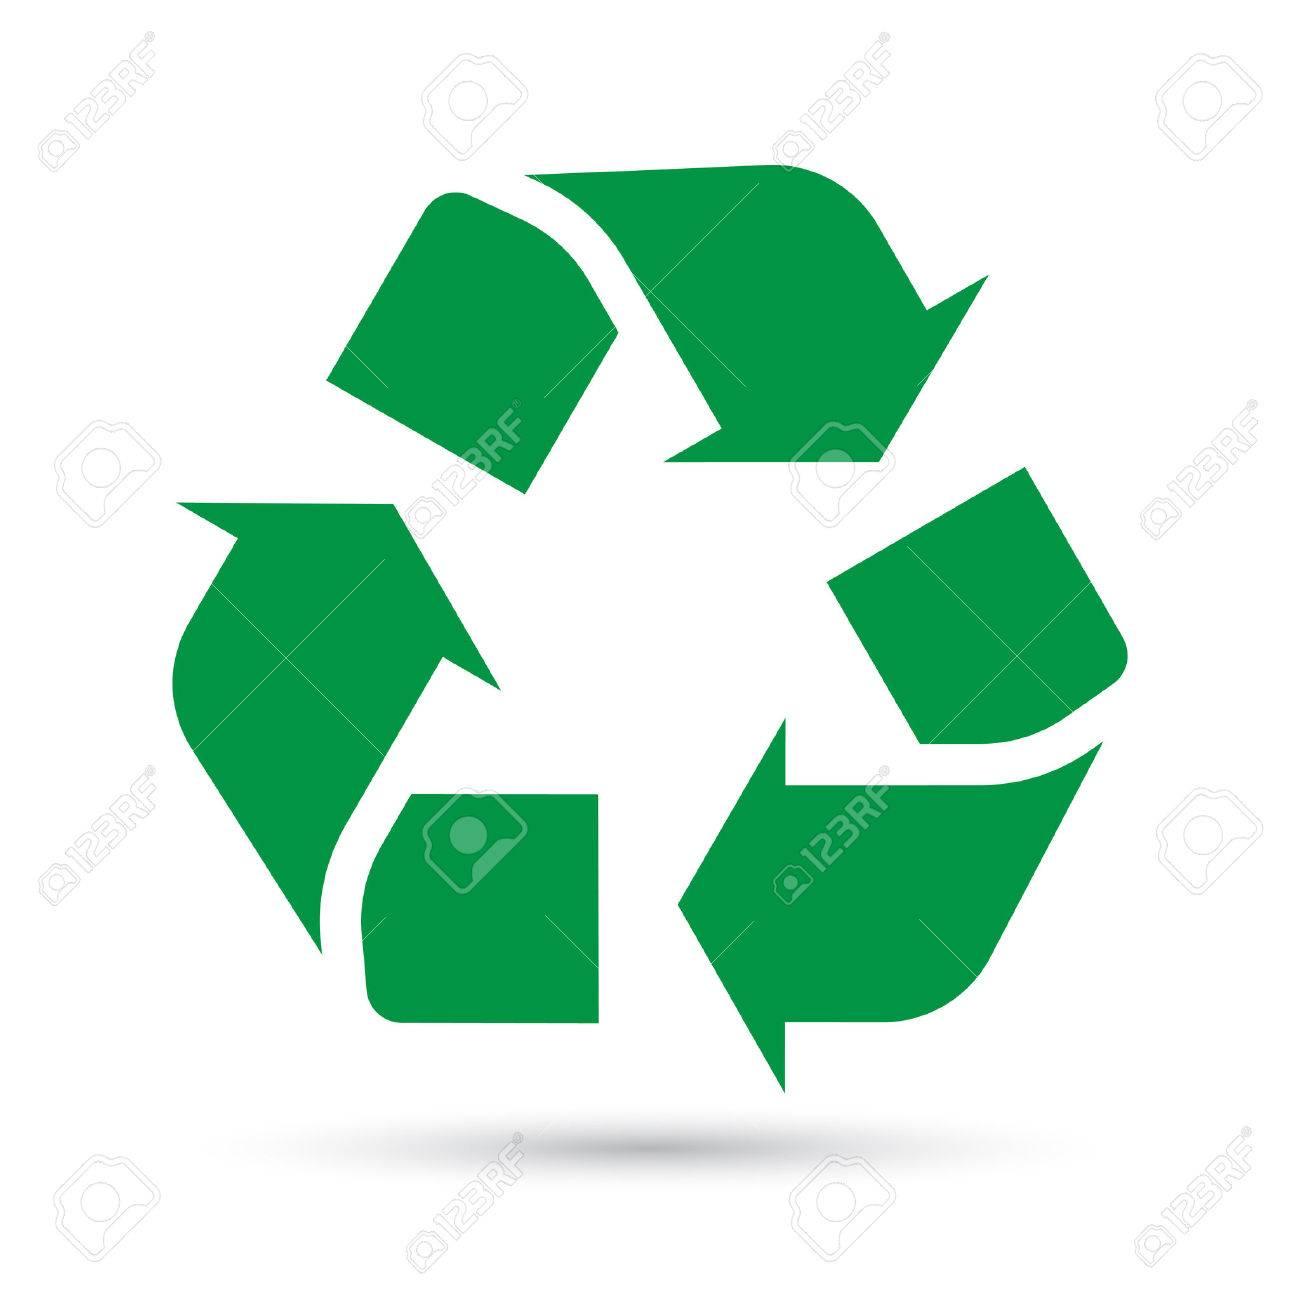 Recycle sign on white background.Illustration eps10 - 43209850